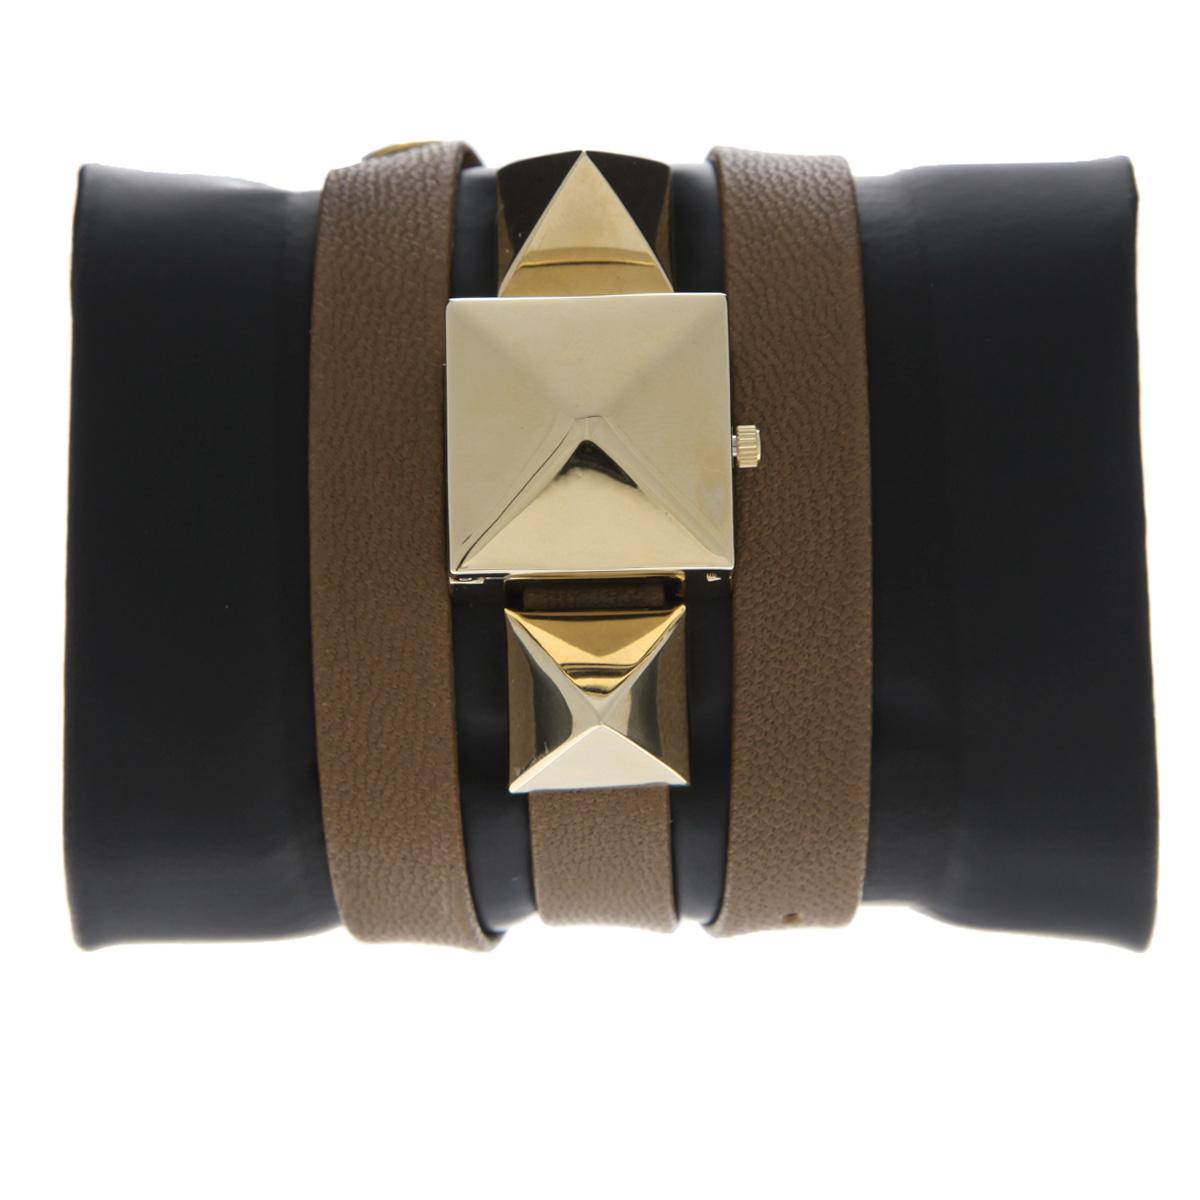 "Часы наручные женские La Mer Collections ""Pyramid Cairo Brown Gold"". LMPYRAMID001 ( LMPYRAMID001 )"